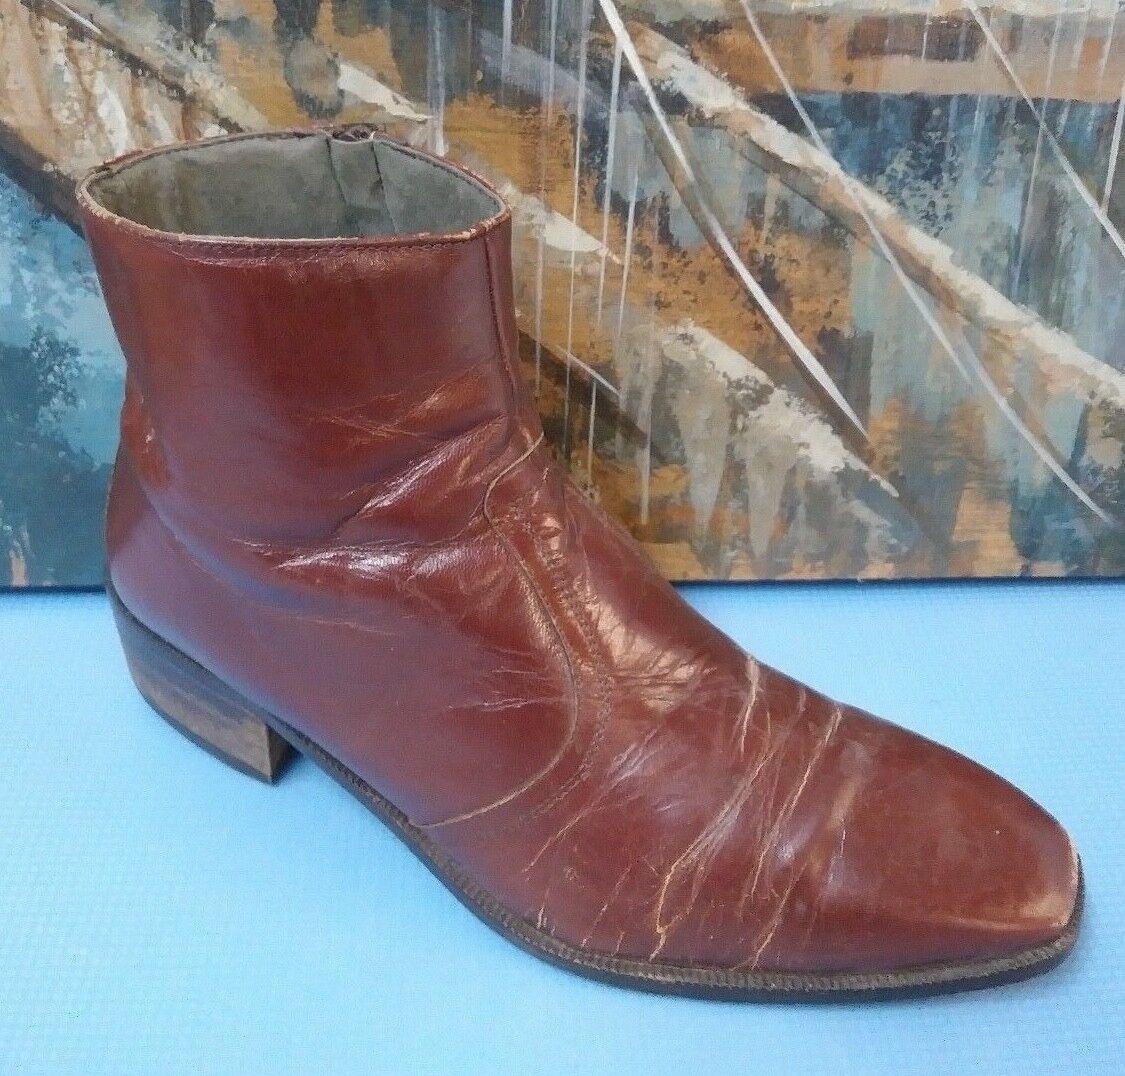 Rodolfo Valentino BURGUNDY Leather Dress Fashion Stiefel Men Footwear Spain 10 M